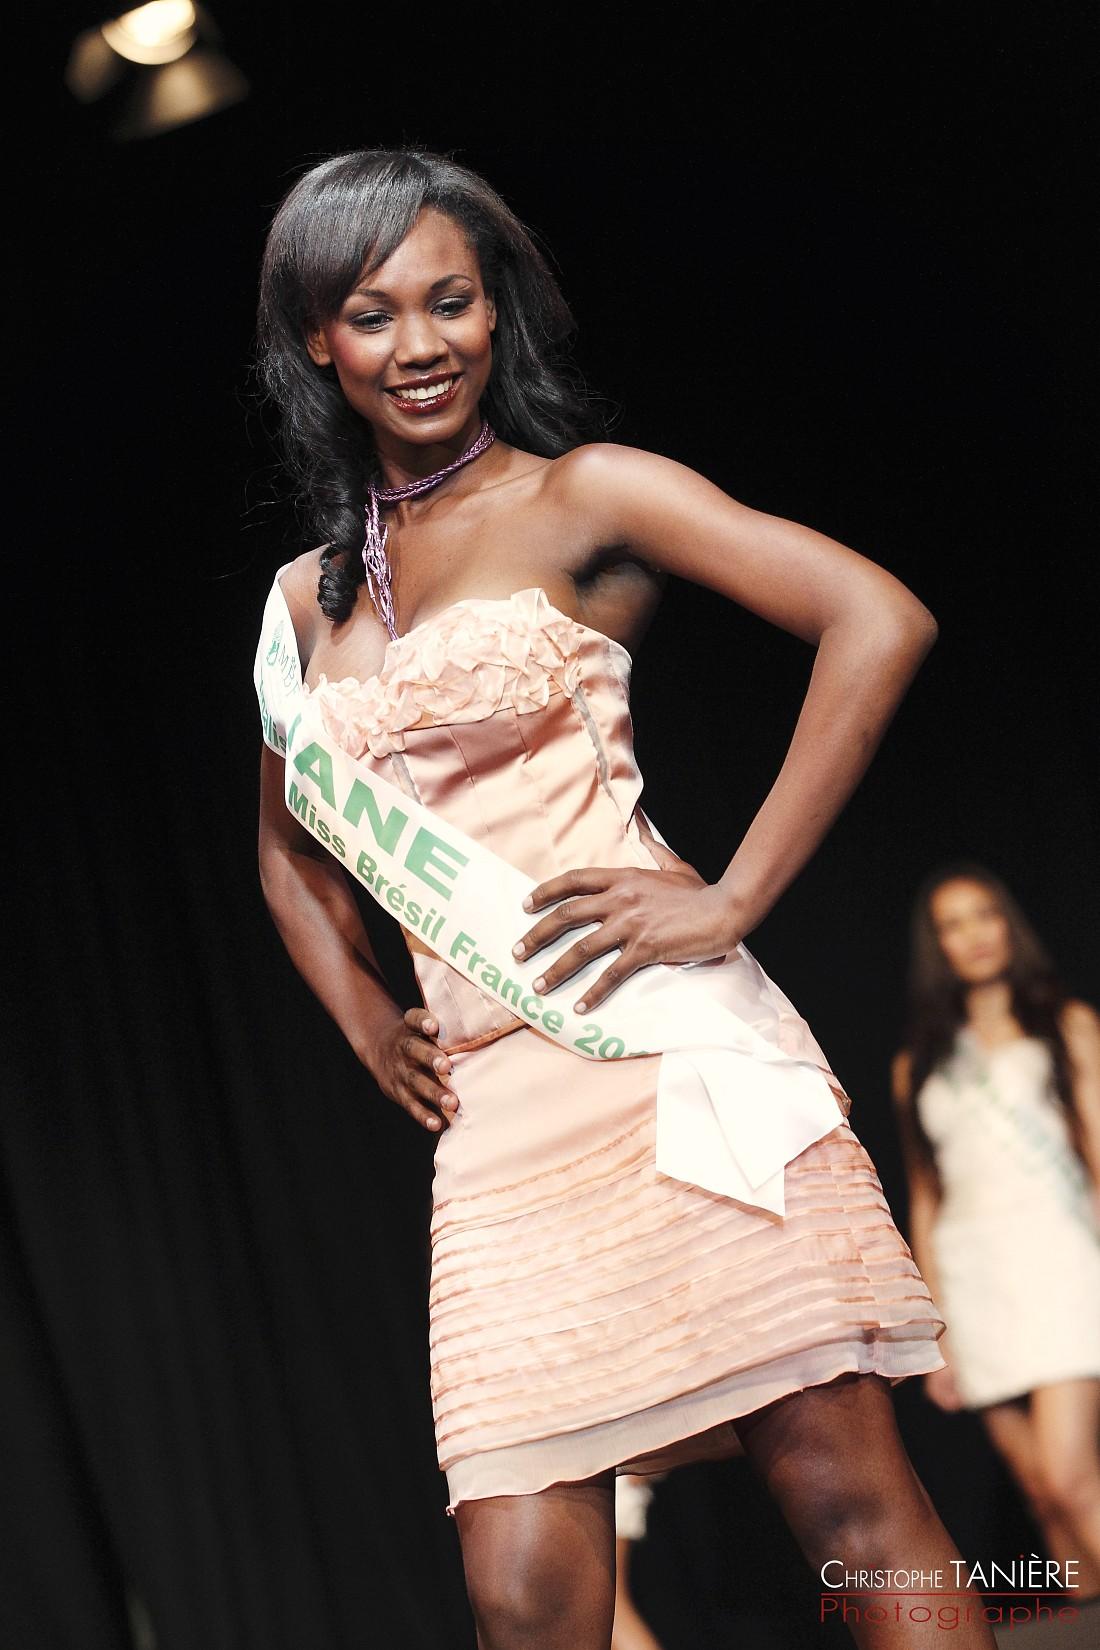 Miss Bresil France 2013-Iane Conceiçao dos Santos